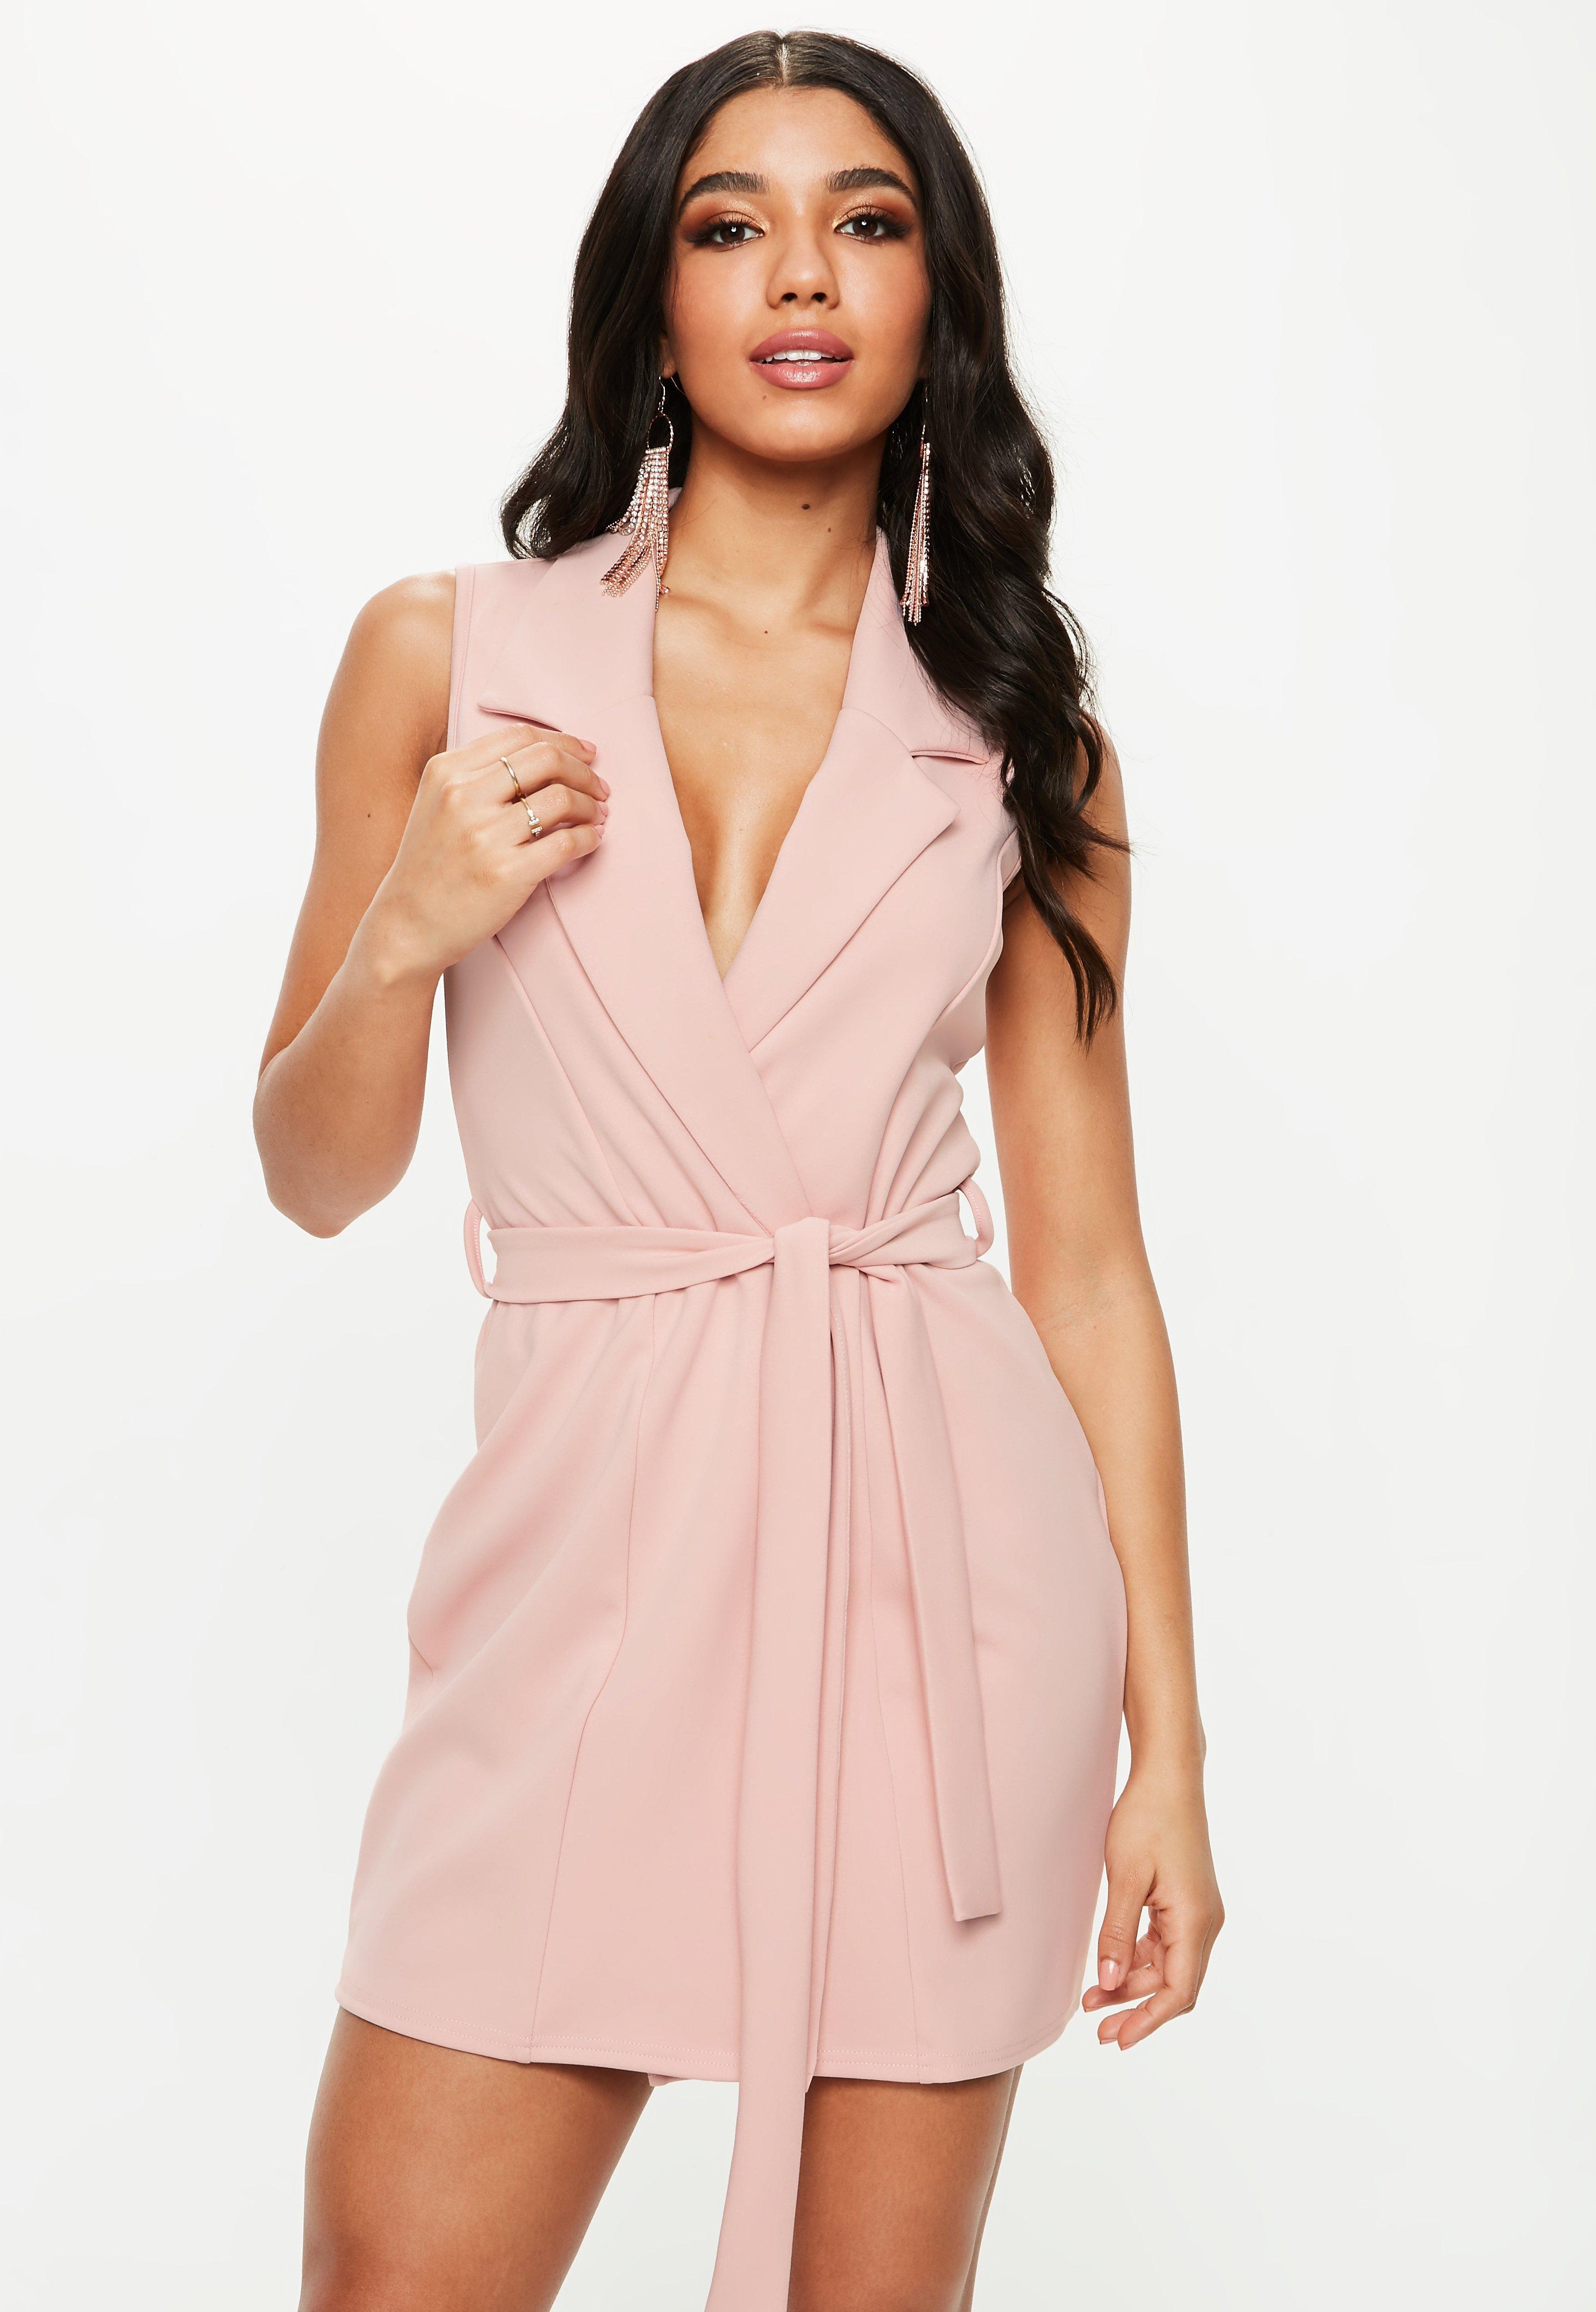 Blazer Dresses | Shop Tuxedo Dresses - Missguided